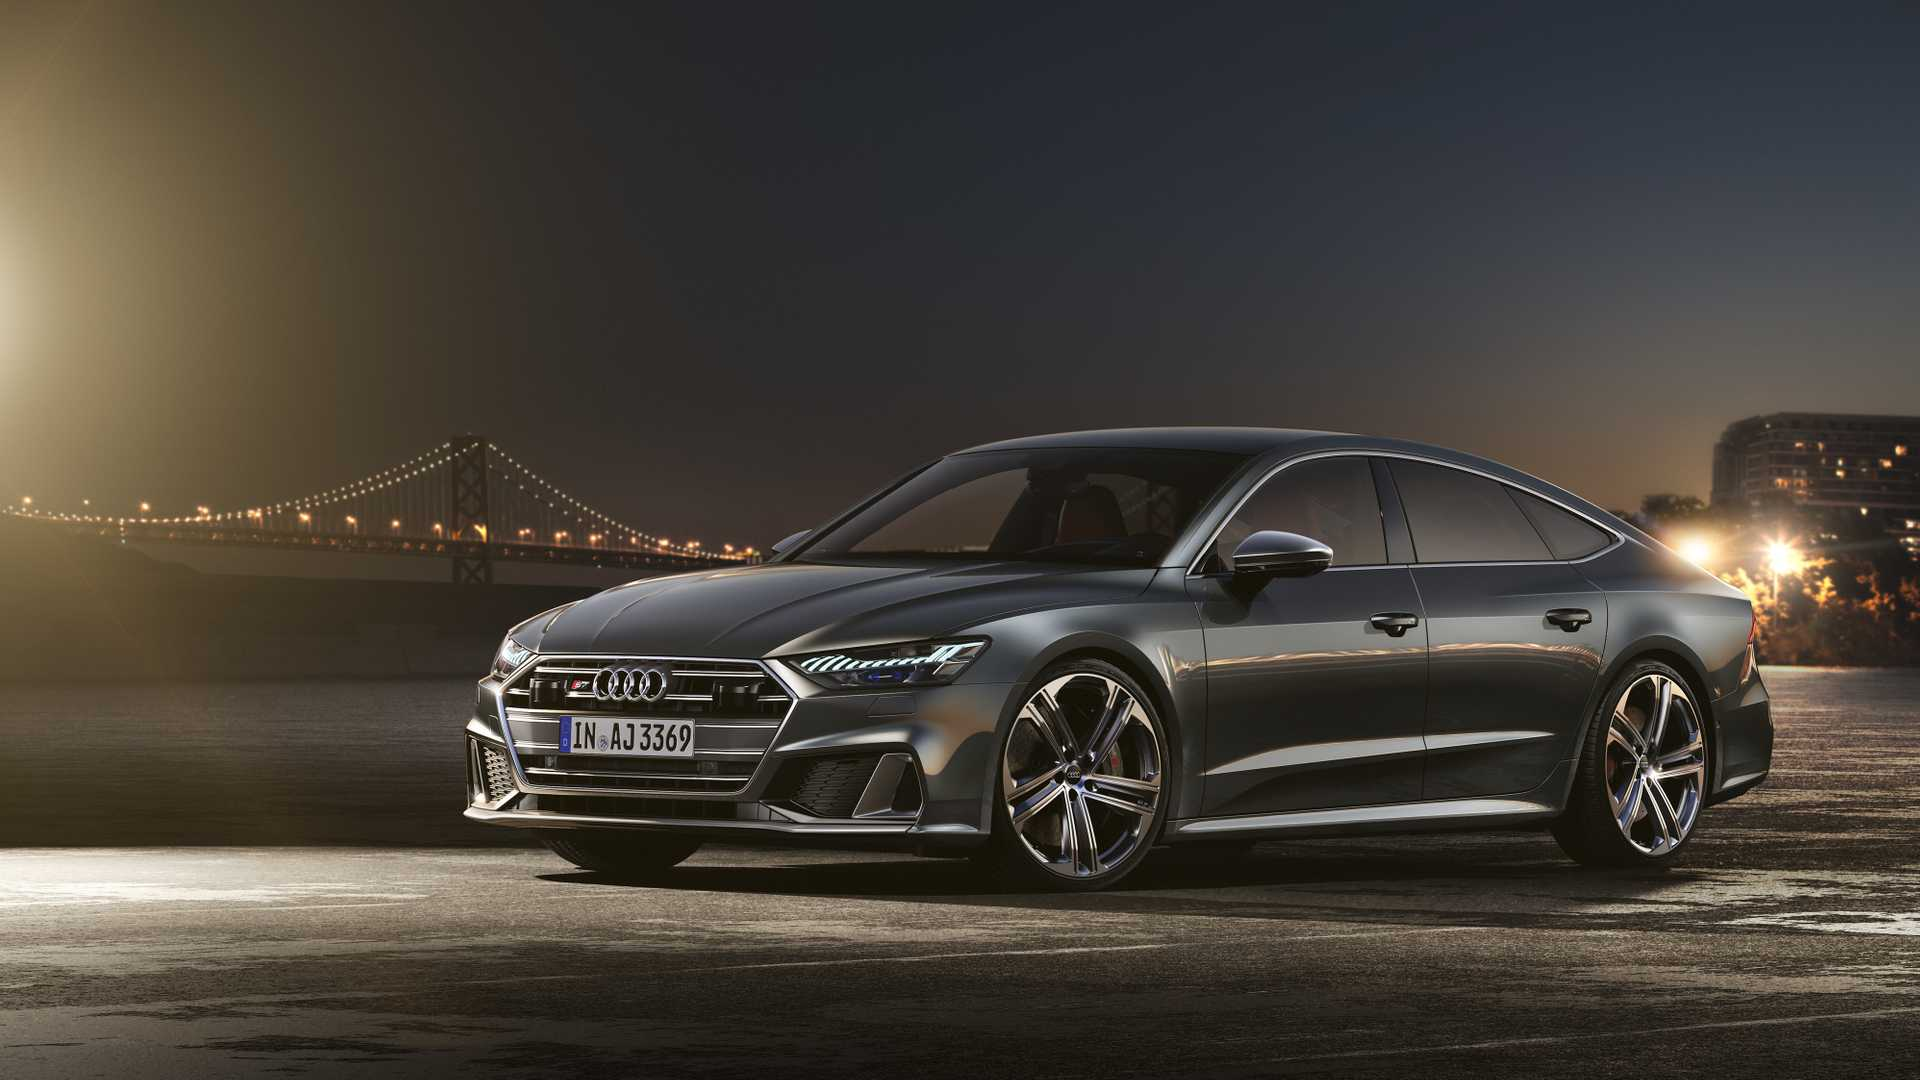 2020 Audi S7 Sportback Costs 10 000 More Than S6 Sedan